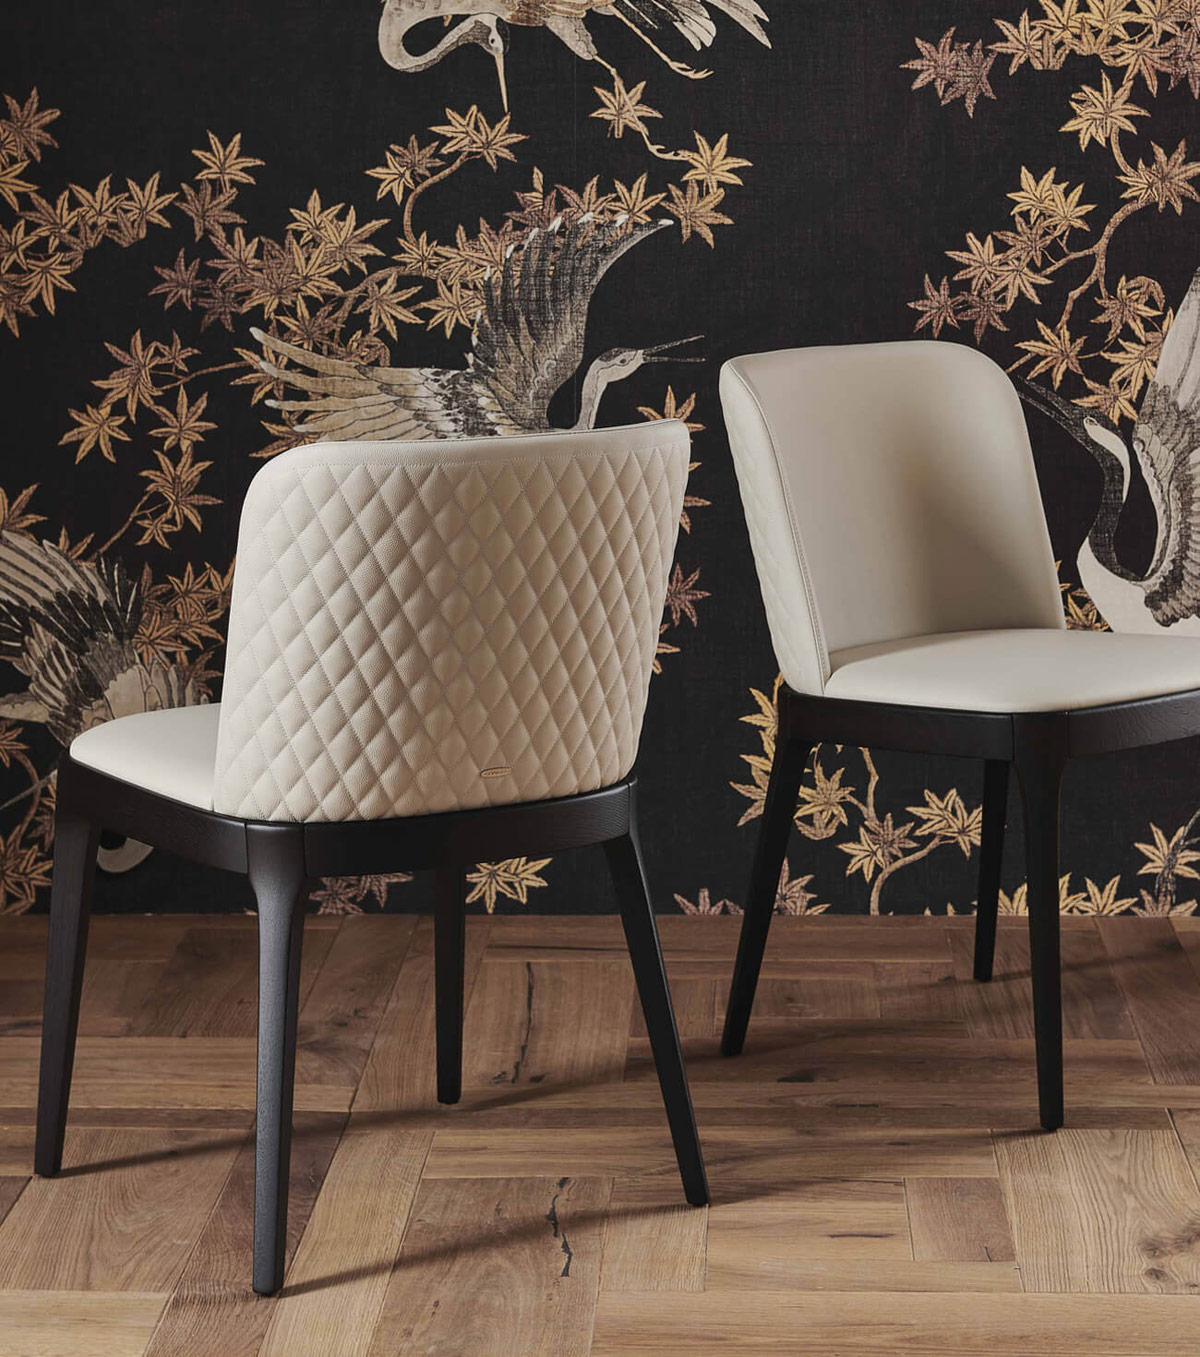 Italov jsou mist i designu a stylu pus te do sv ch for Design sedie moderne